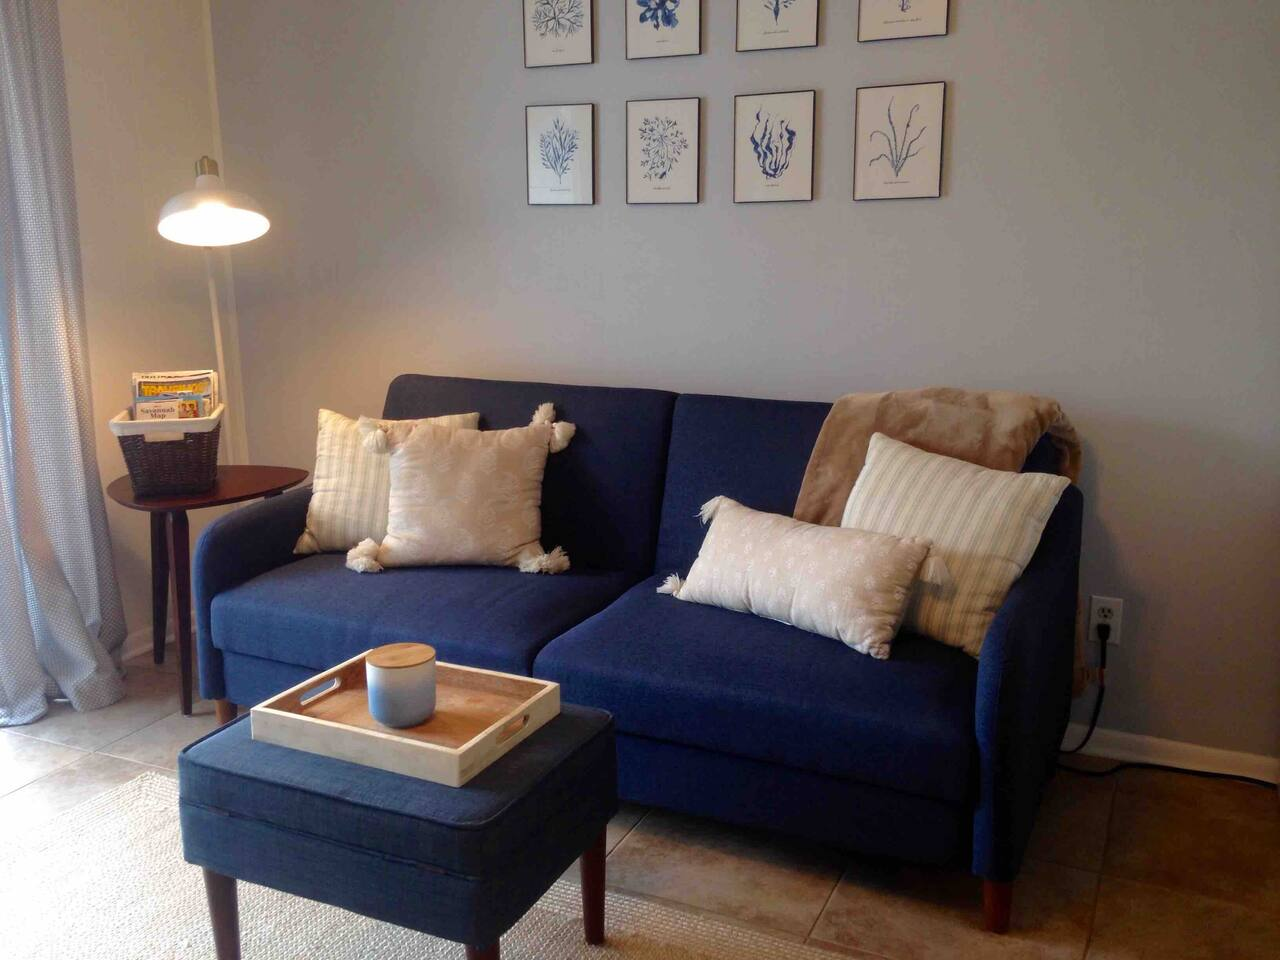 Living area with Futon sofa